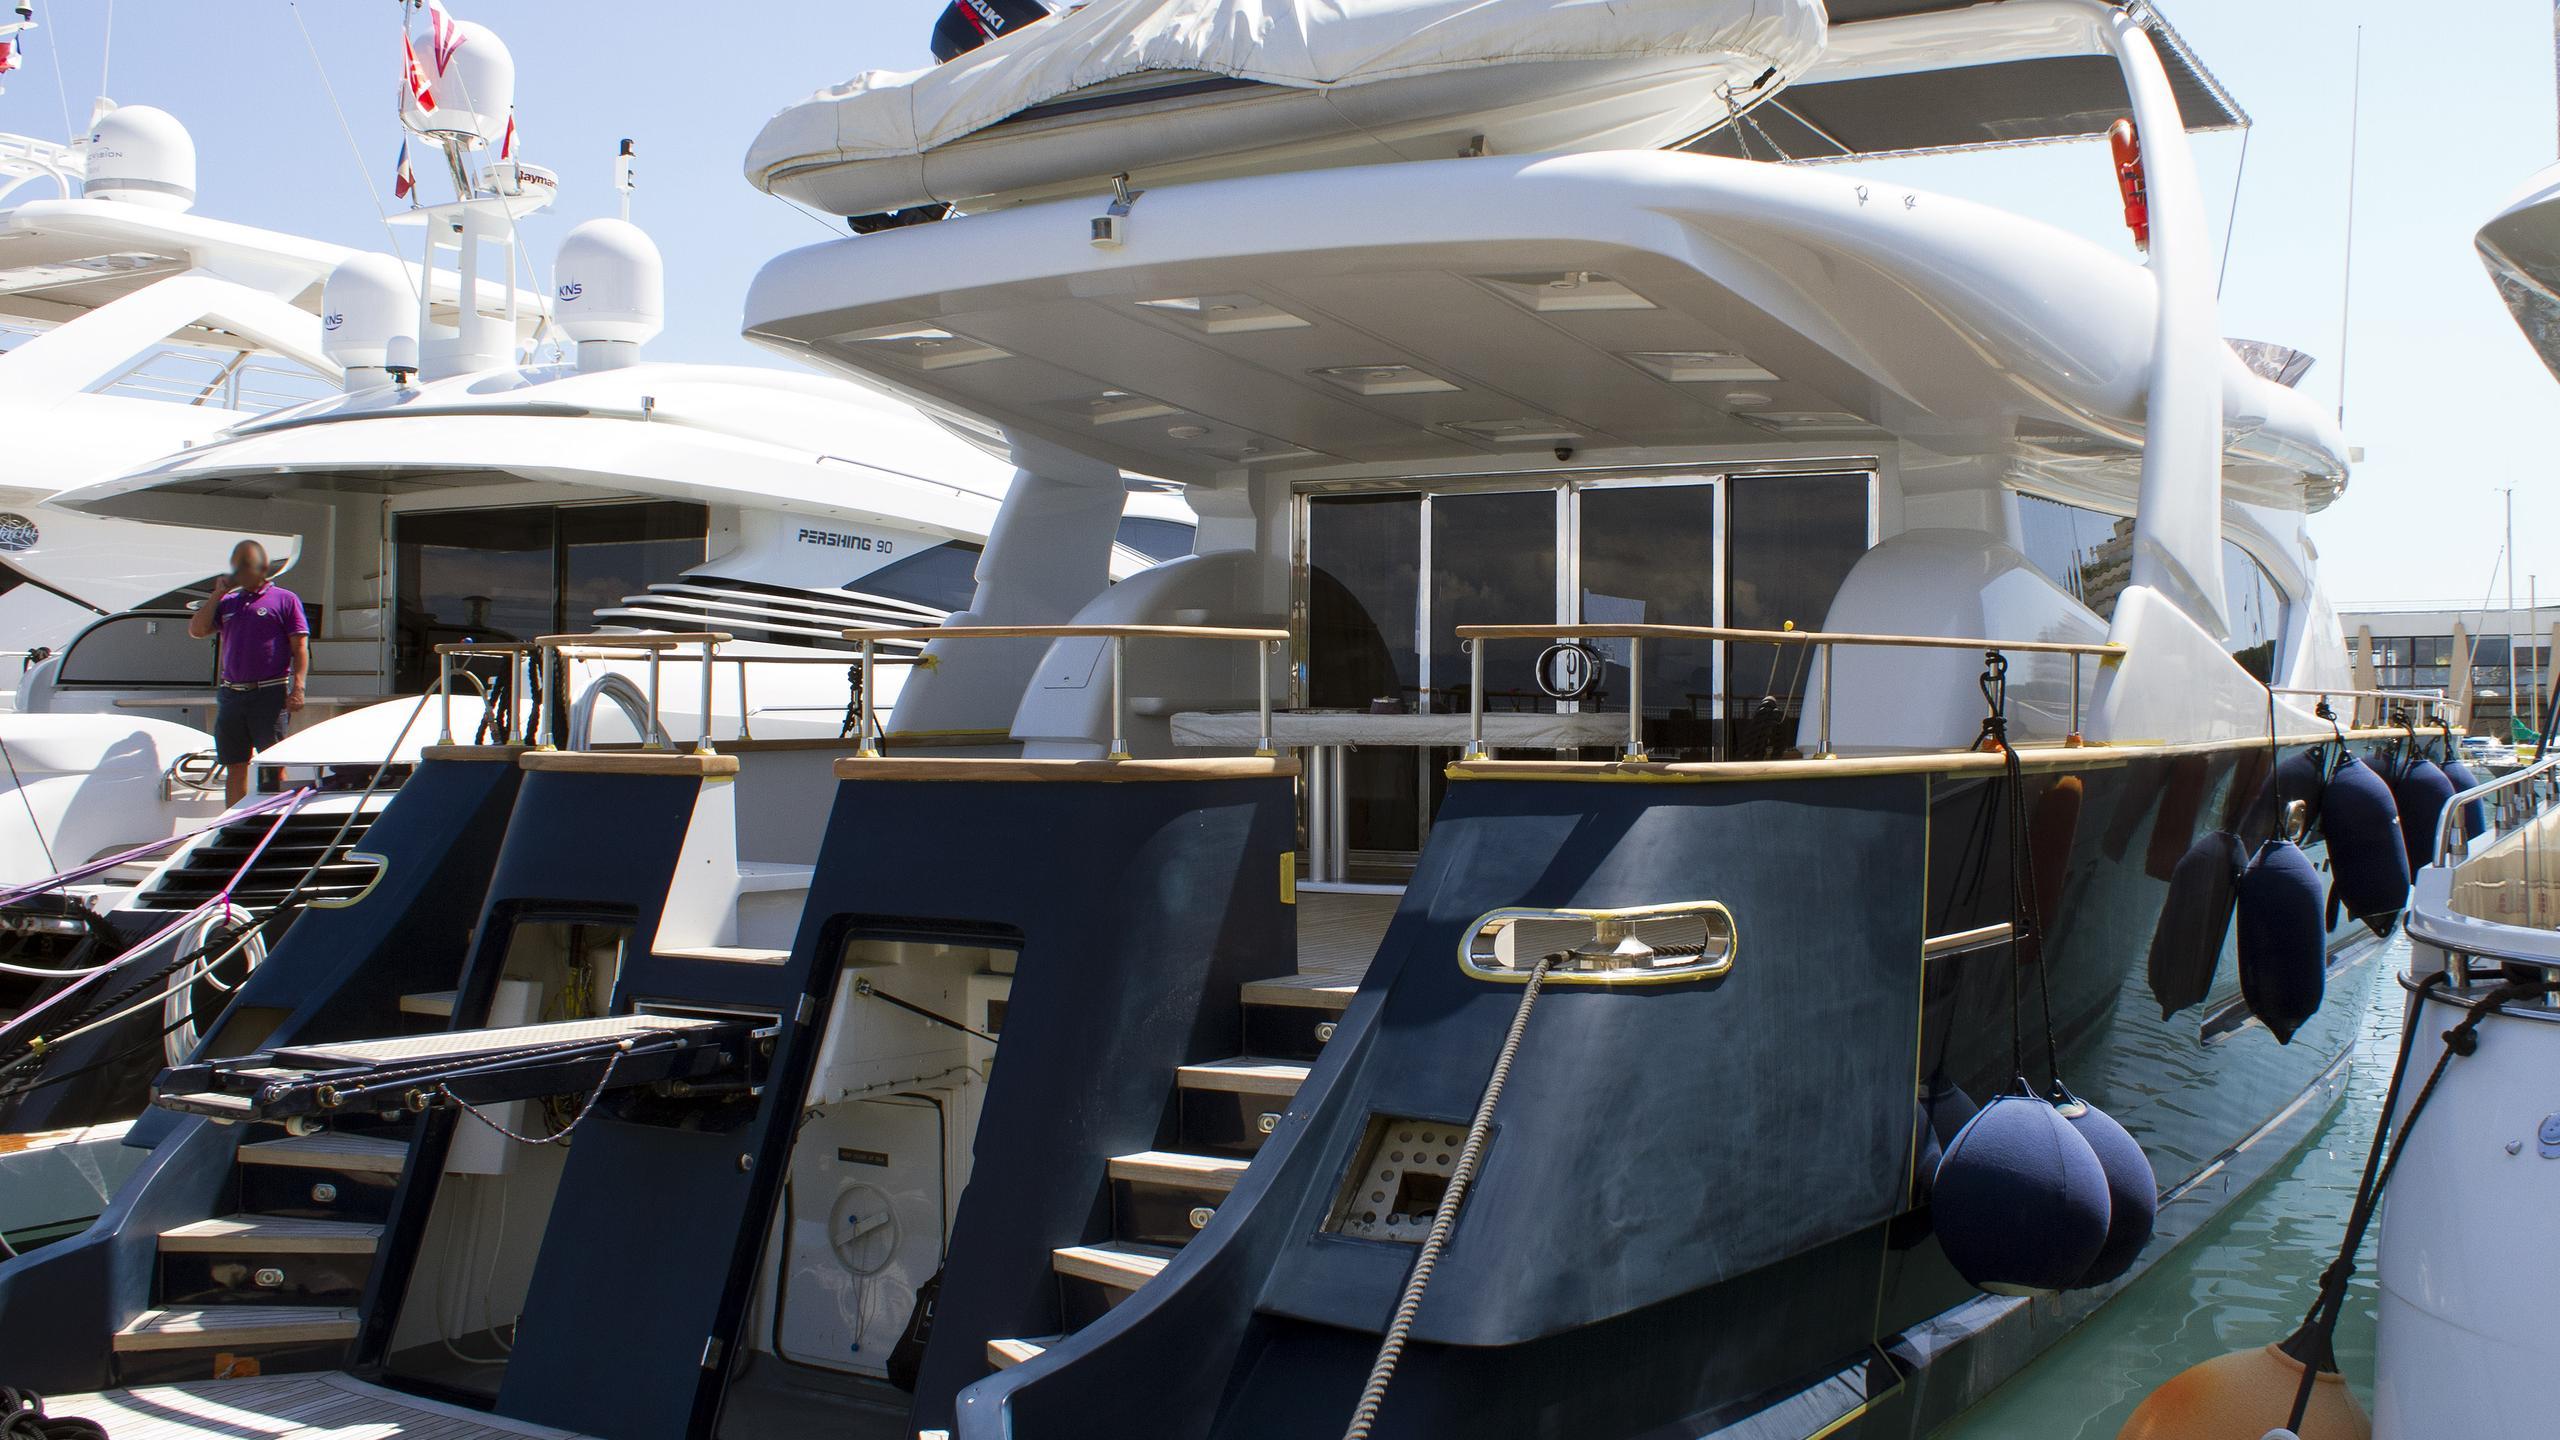 mabruk-ii-motor-yacht-notika-teknik-emerald-90-1997-27m-moored-stern